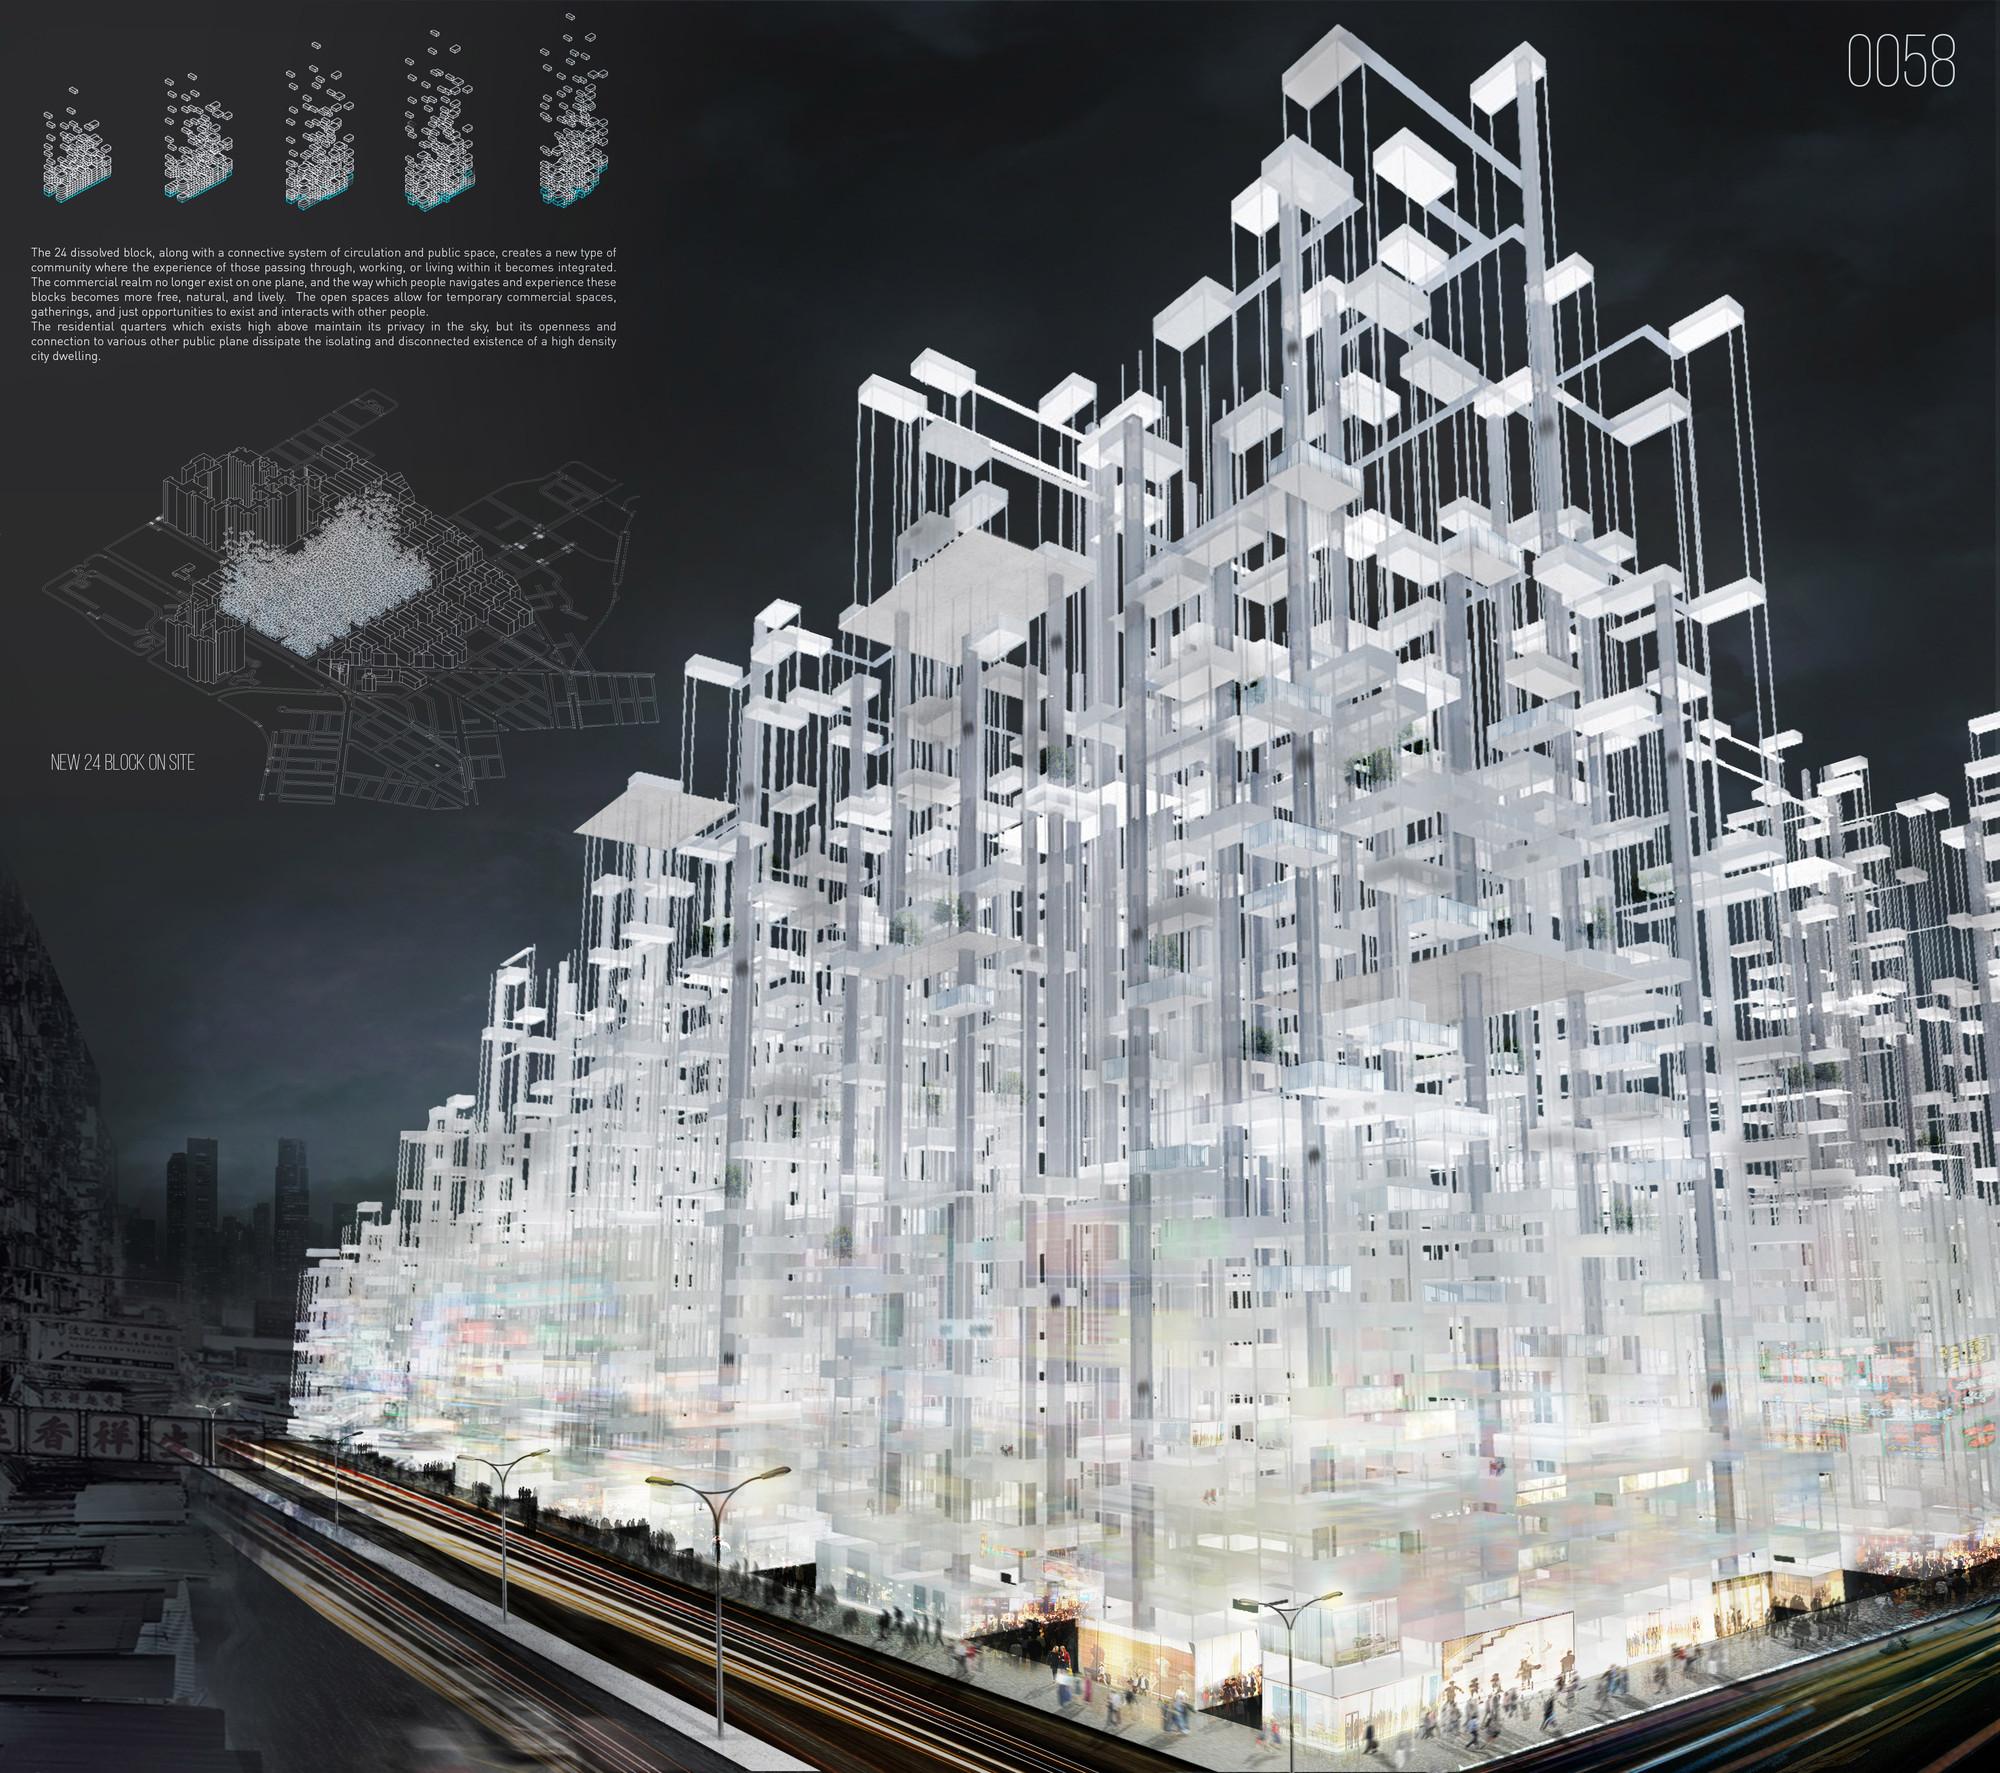 Diffused Boundaries Skyscraper / Satavee Kijsanayotin, Ben Novacinski, Hannah Mayer, Haydar Baydoun, Mingxi Ye, Zhifei Chen. Imagen cortesía de eVolo